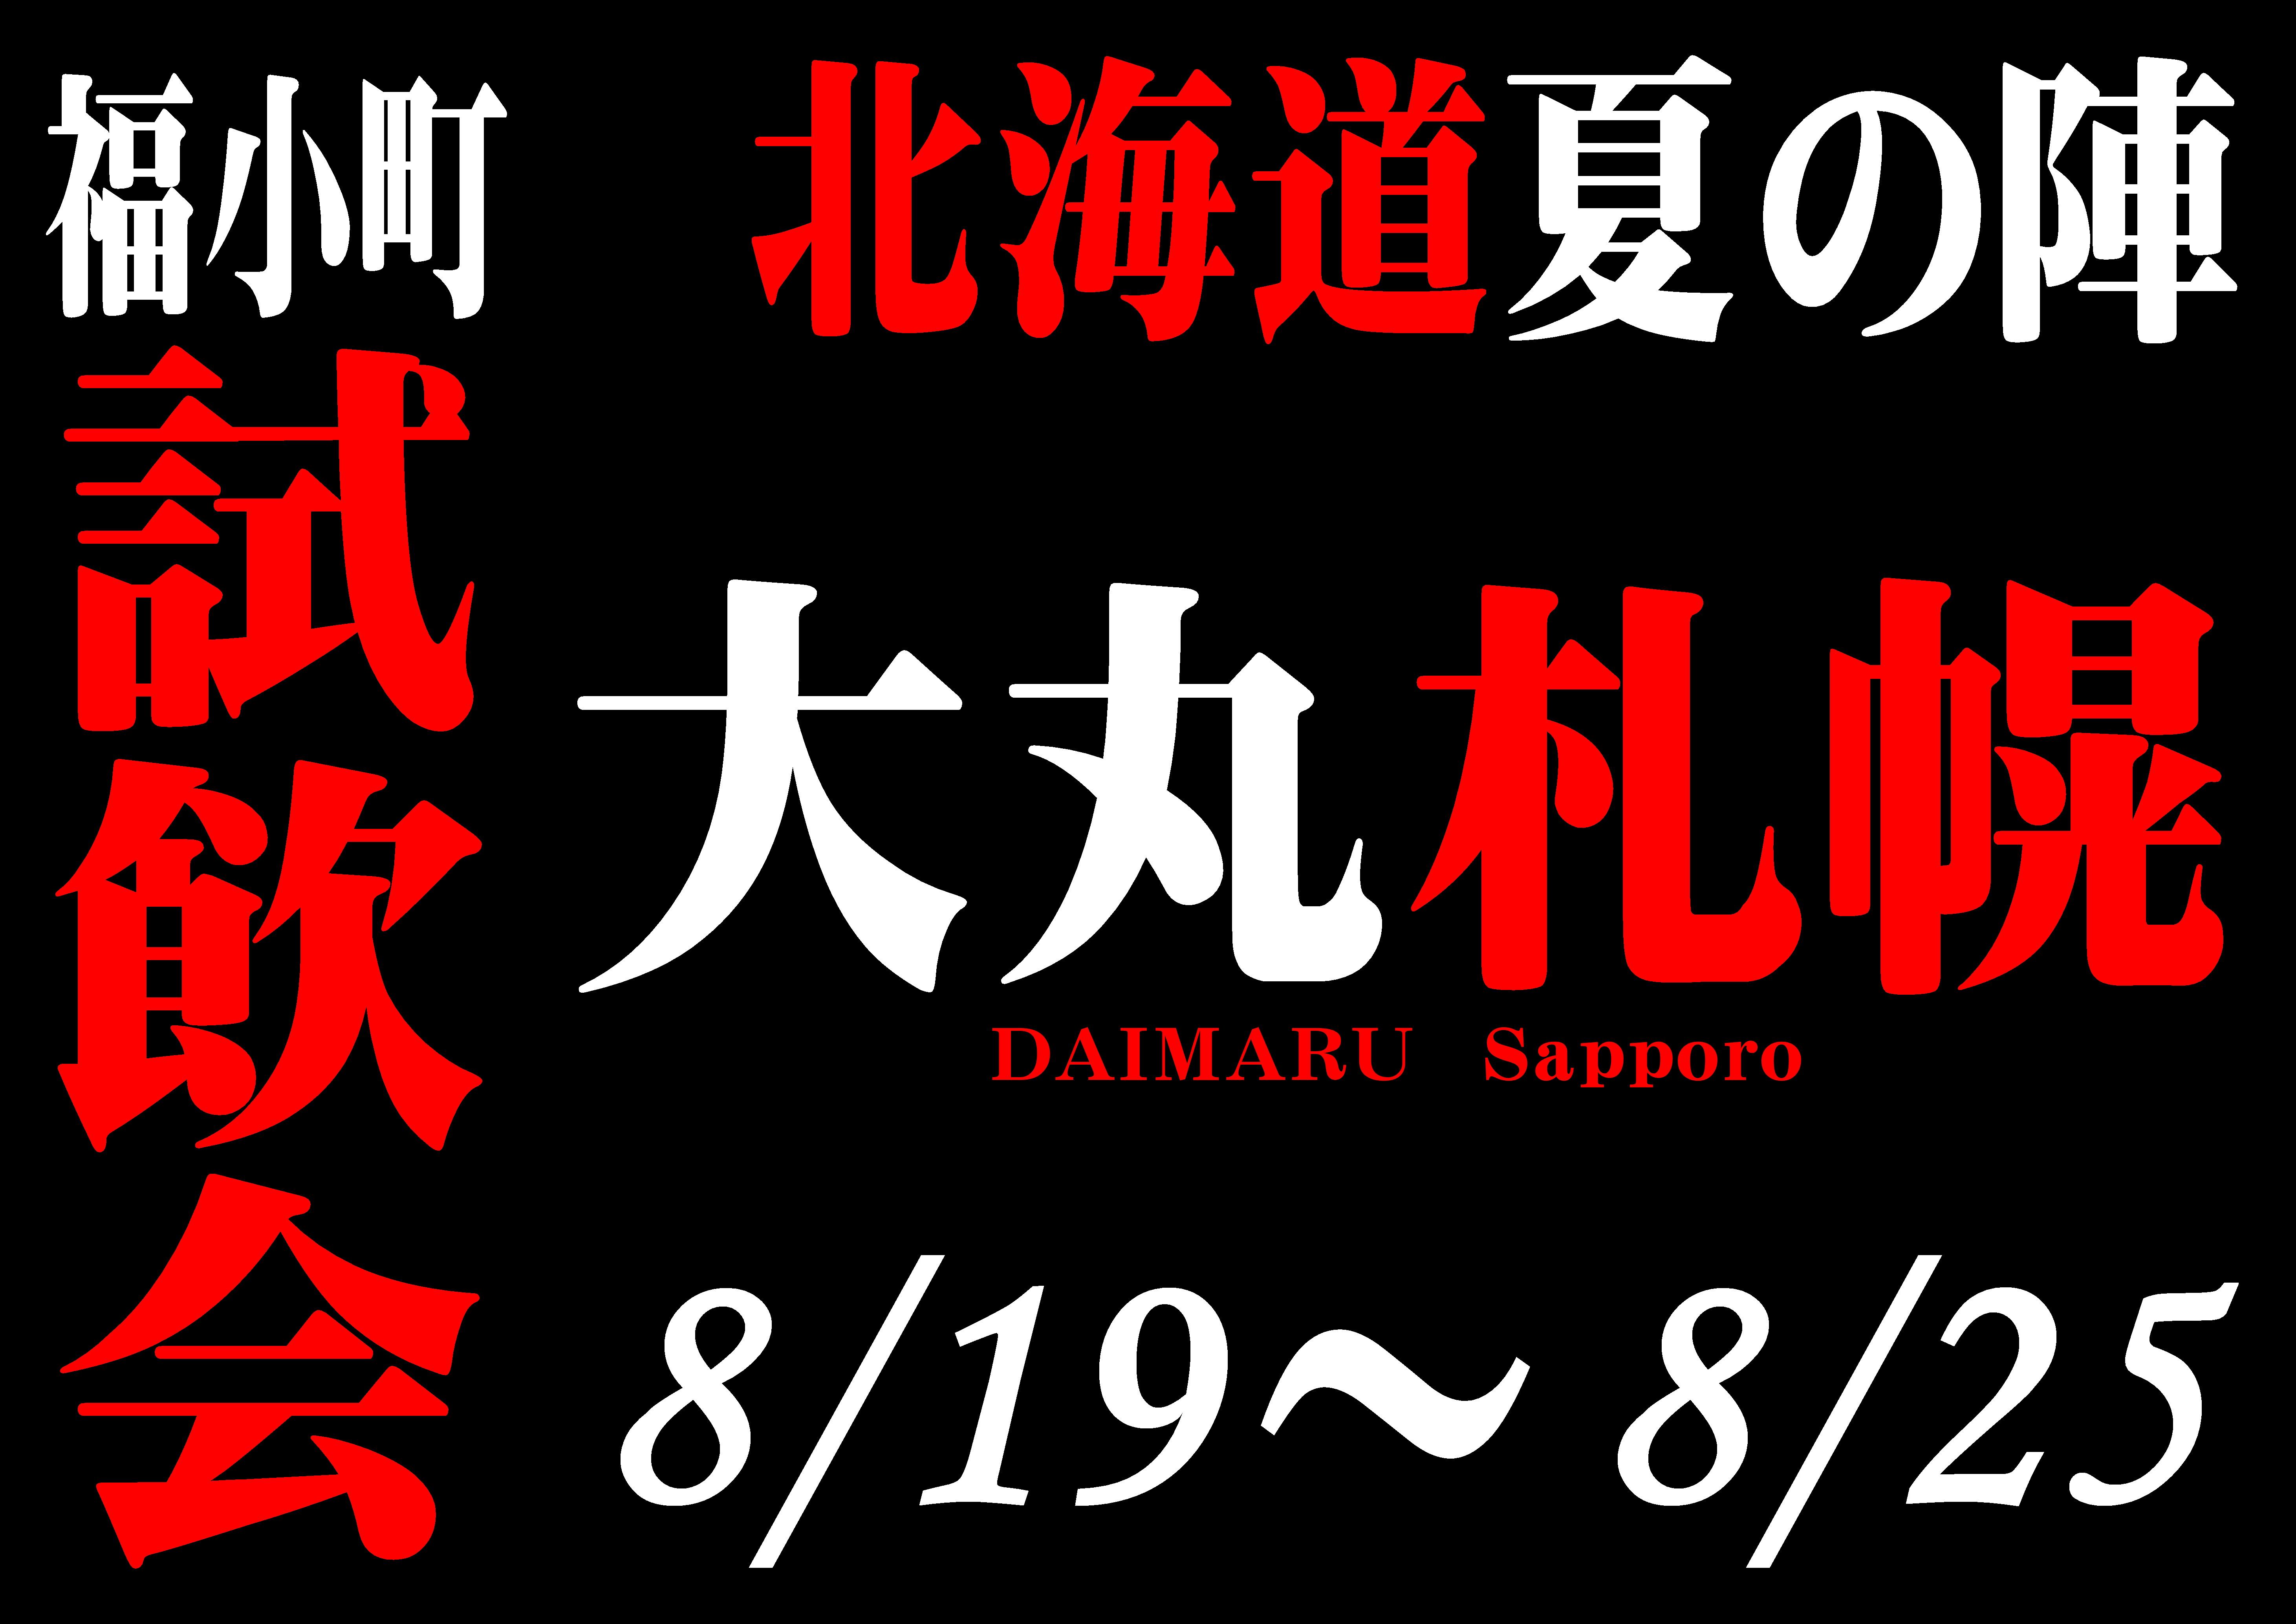 http://www.fukukomachi.com/blog/photo/20200821.JPG